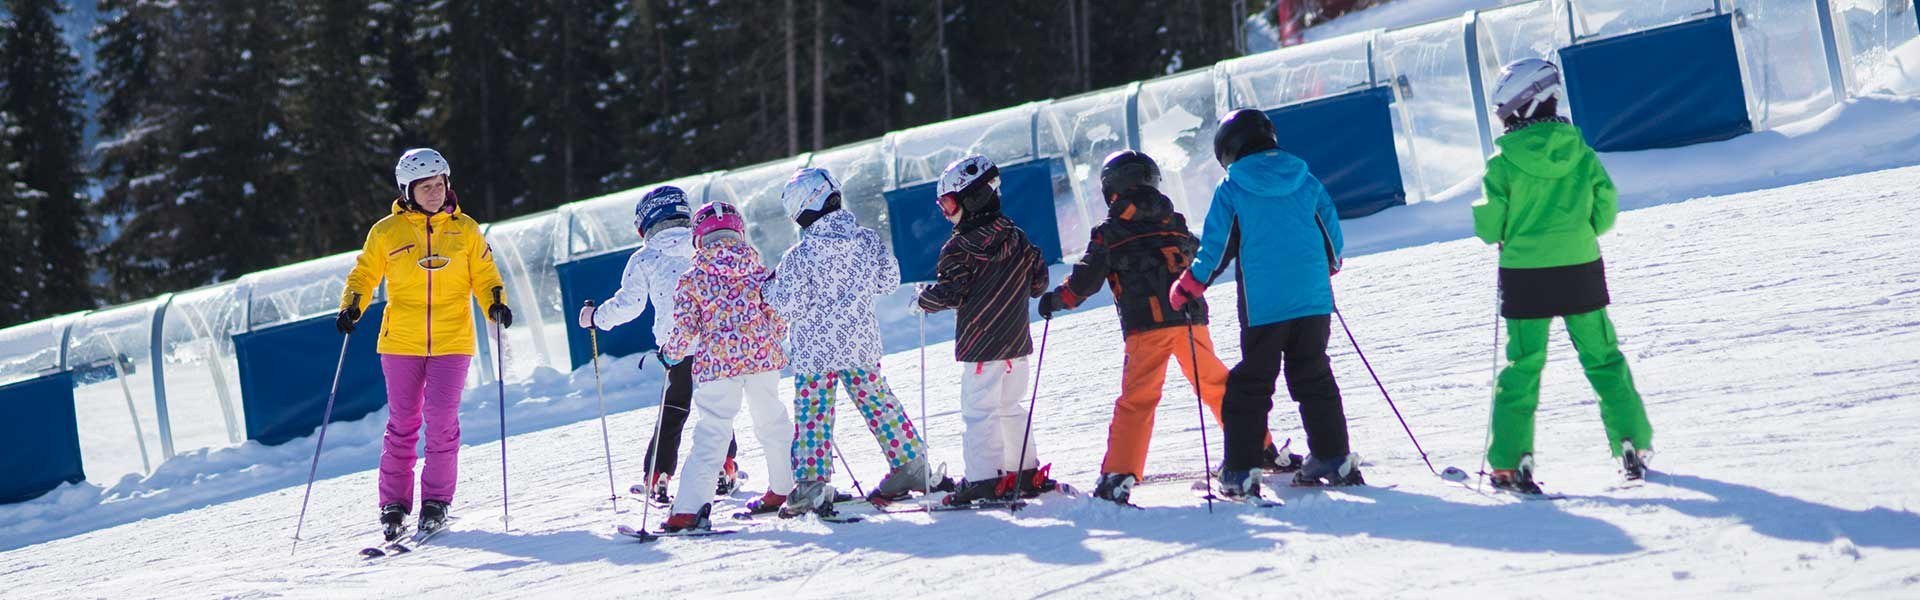 Ski Kurs Ischgl